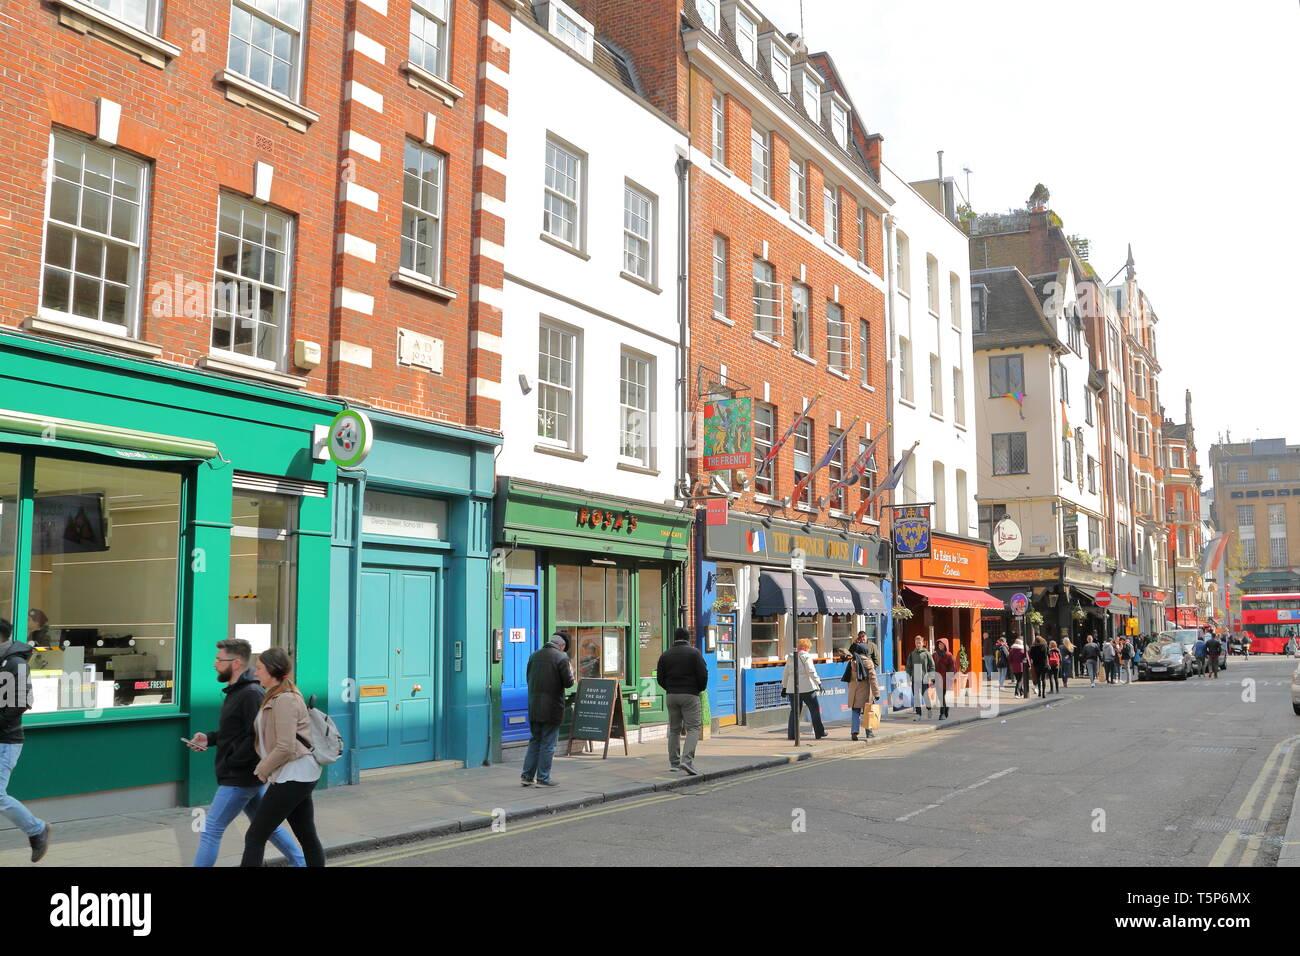 View of Dean Street in Soho, London, UK - Stock Image